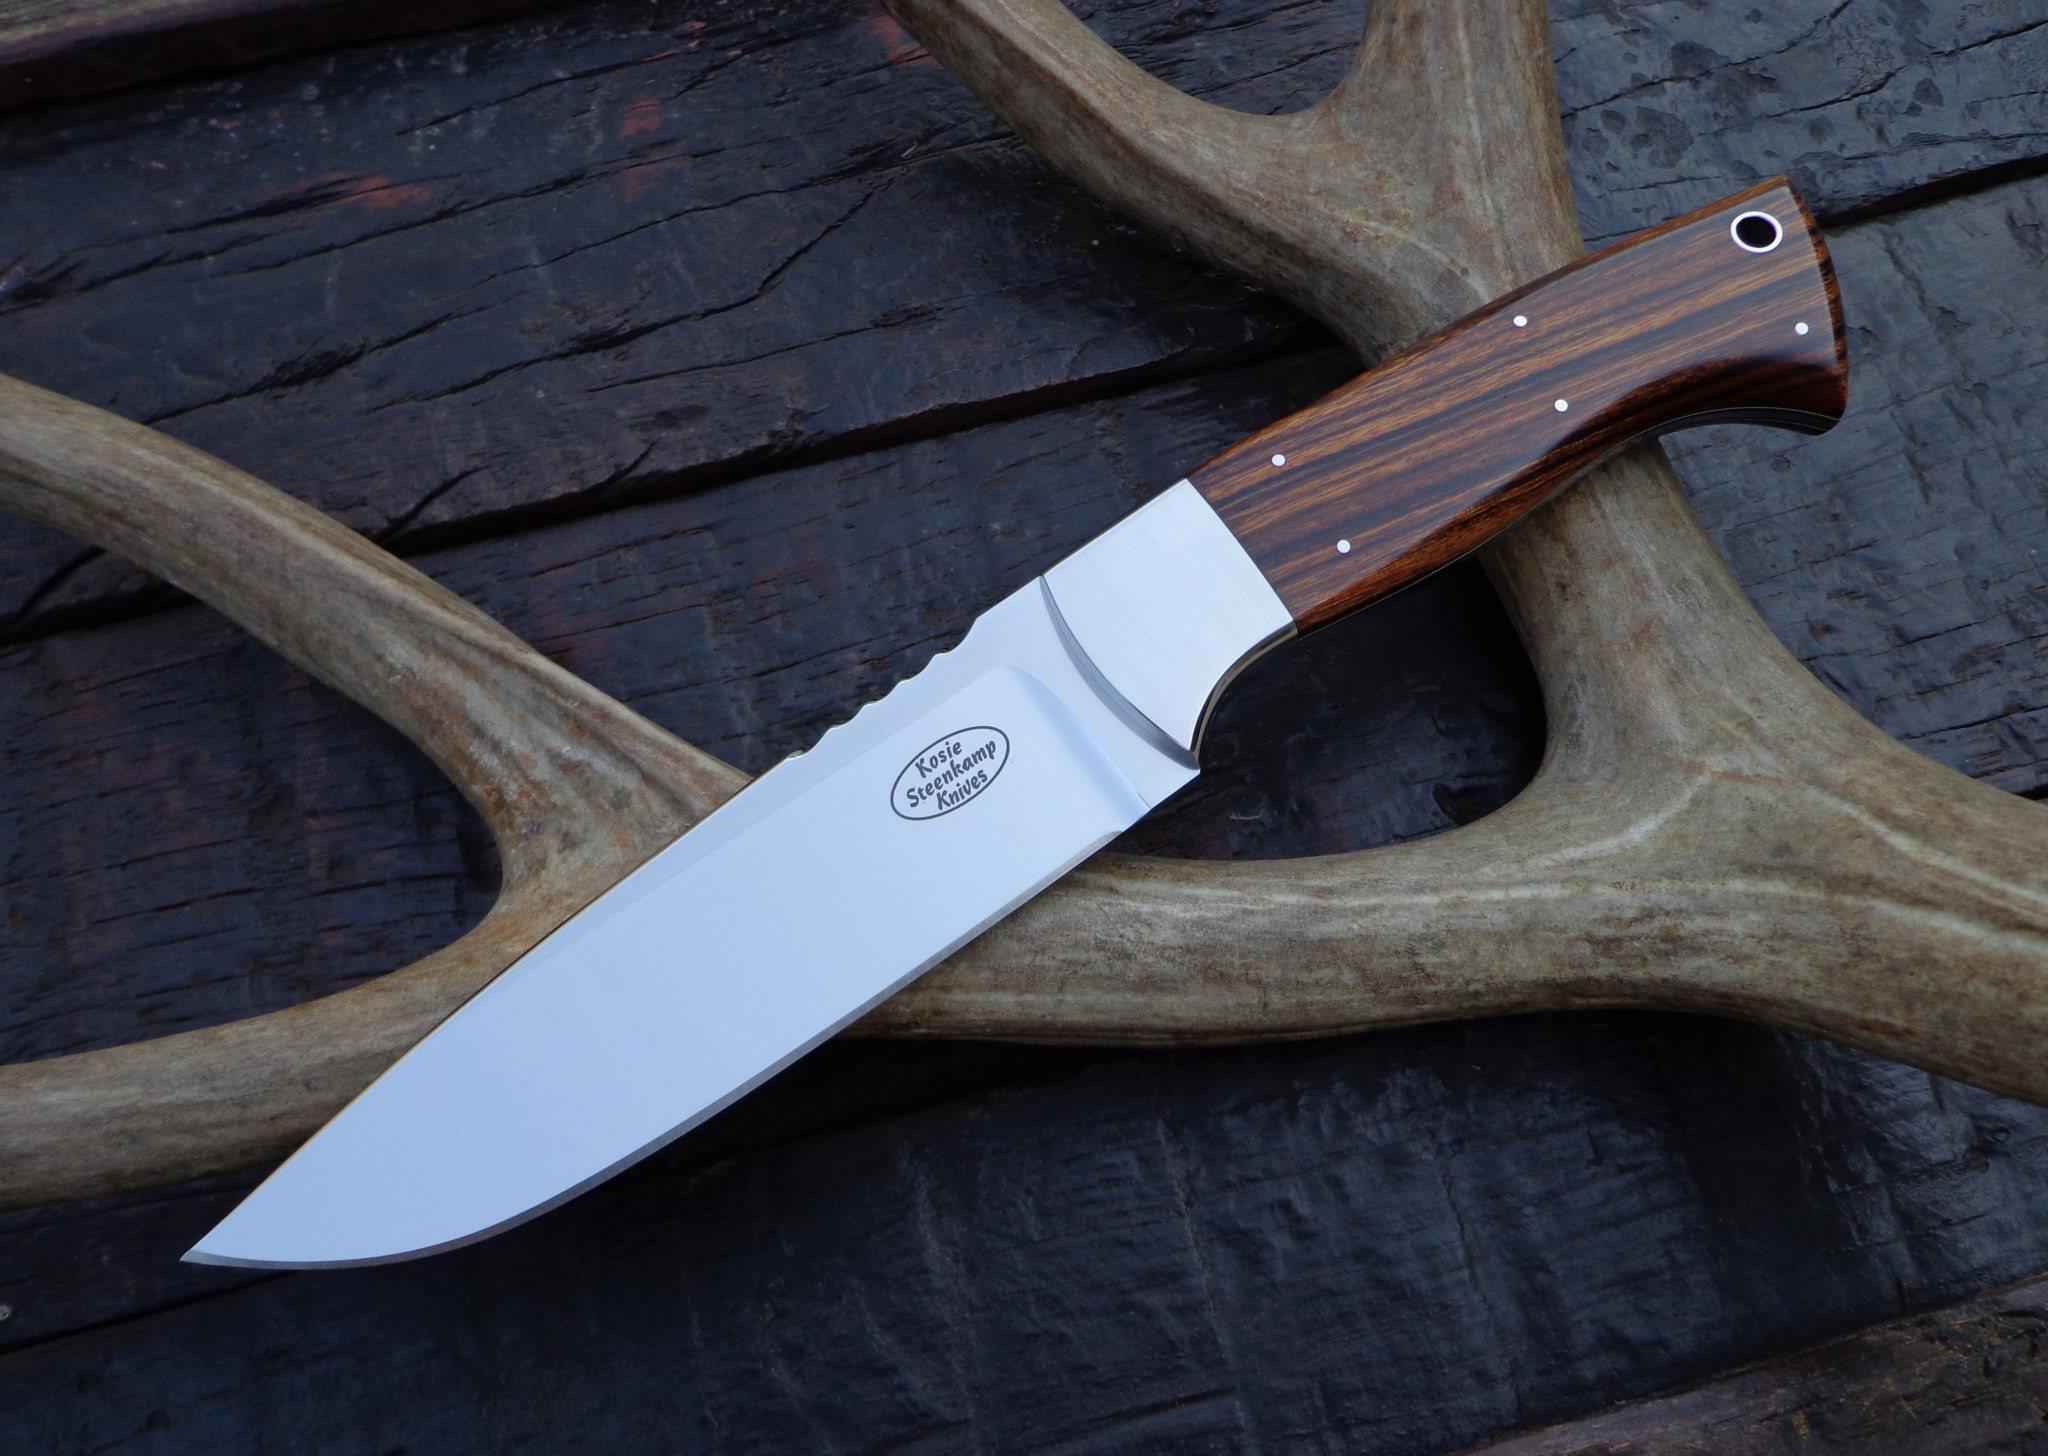 Big Hunter, Bohler N690 blade, 304 S/S bolster and Arizona Desert Ironwood handle.